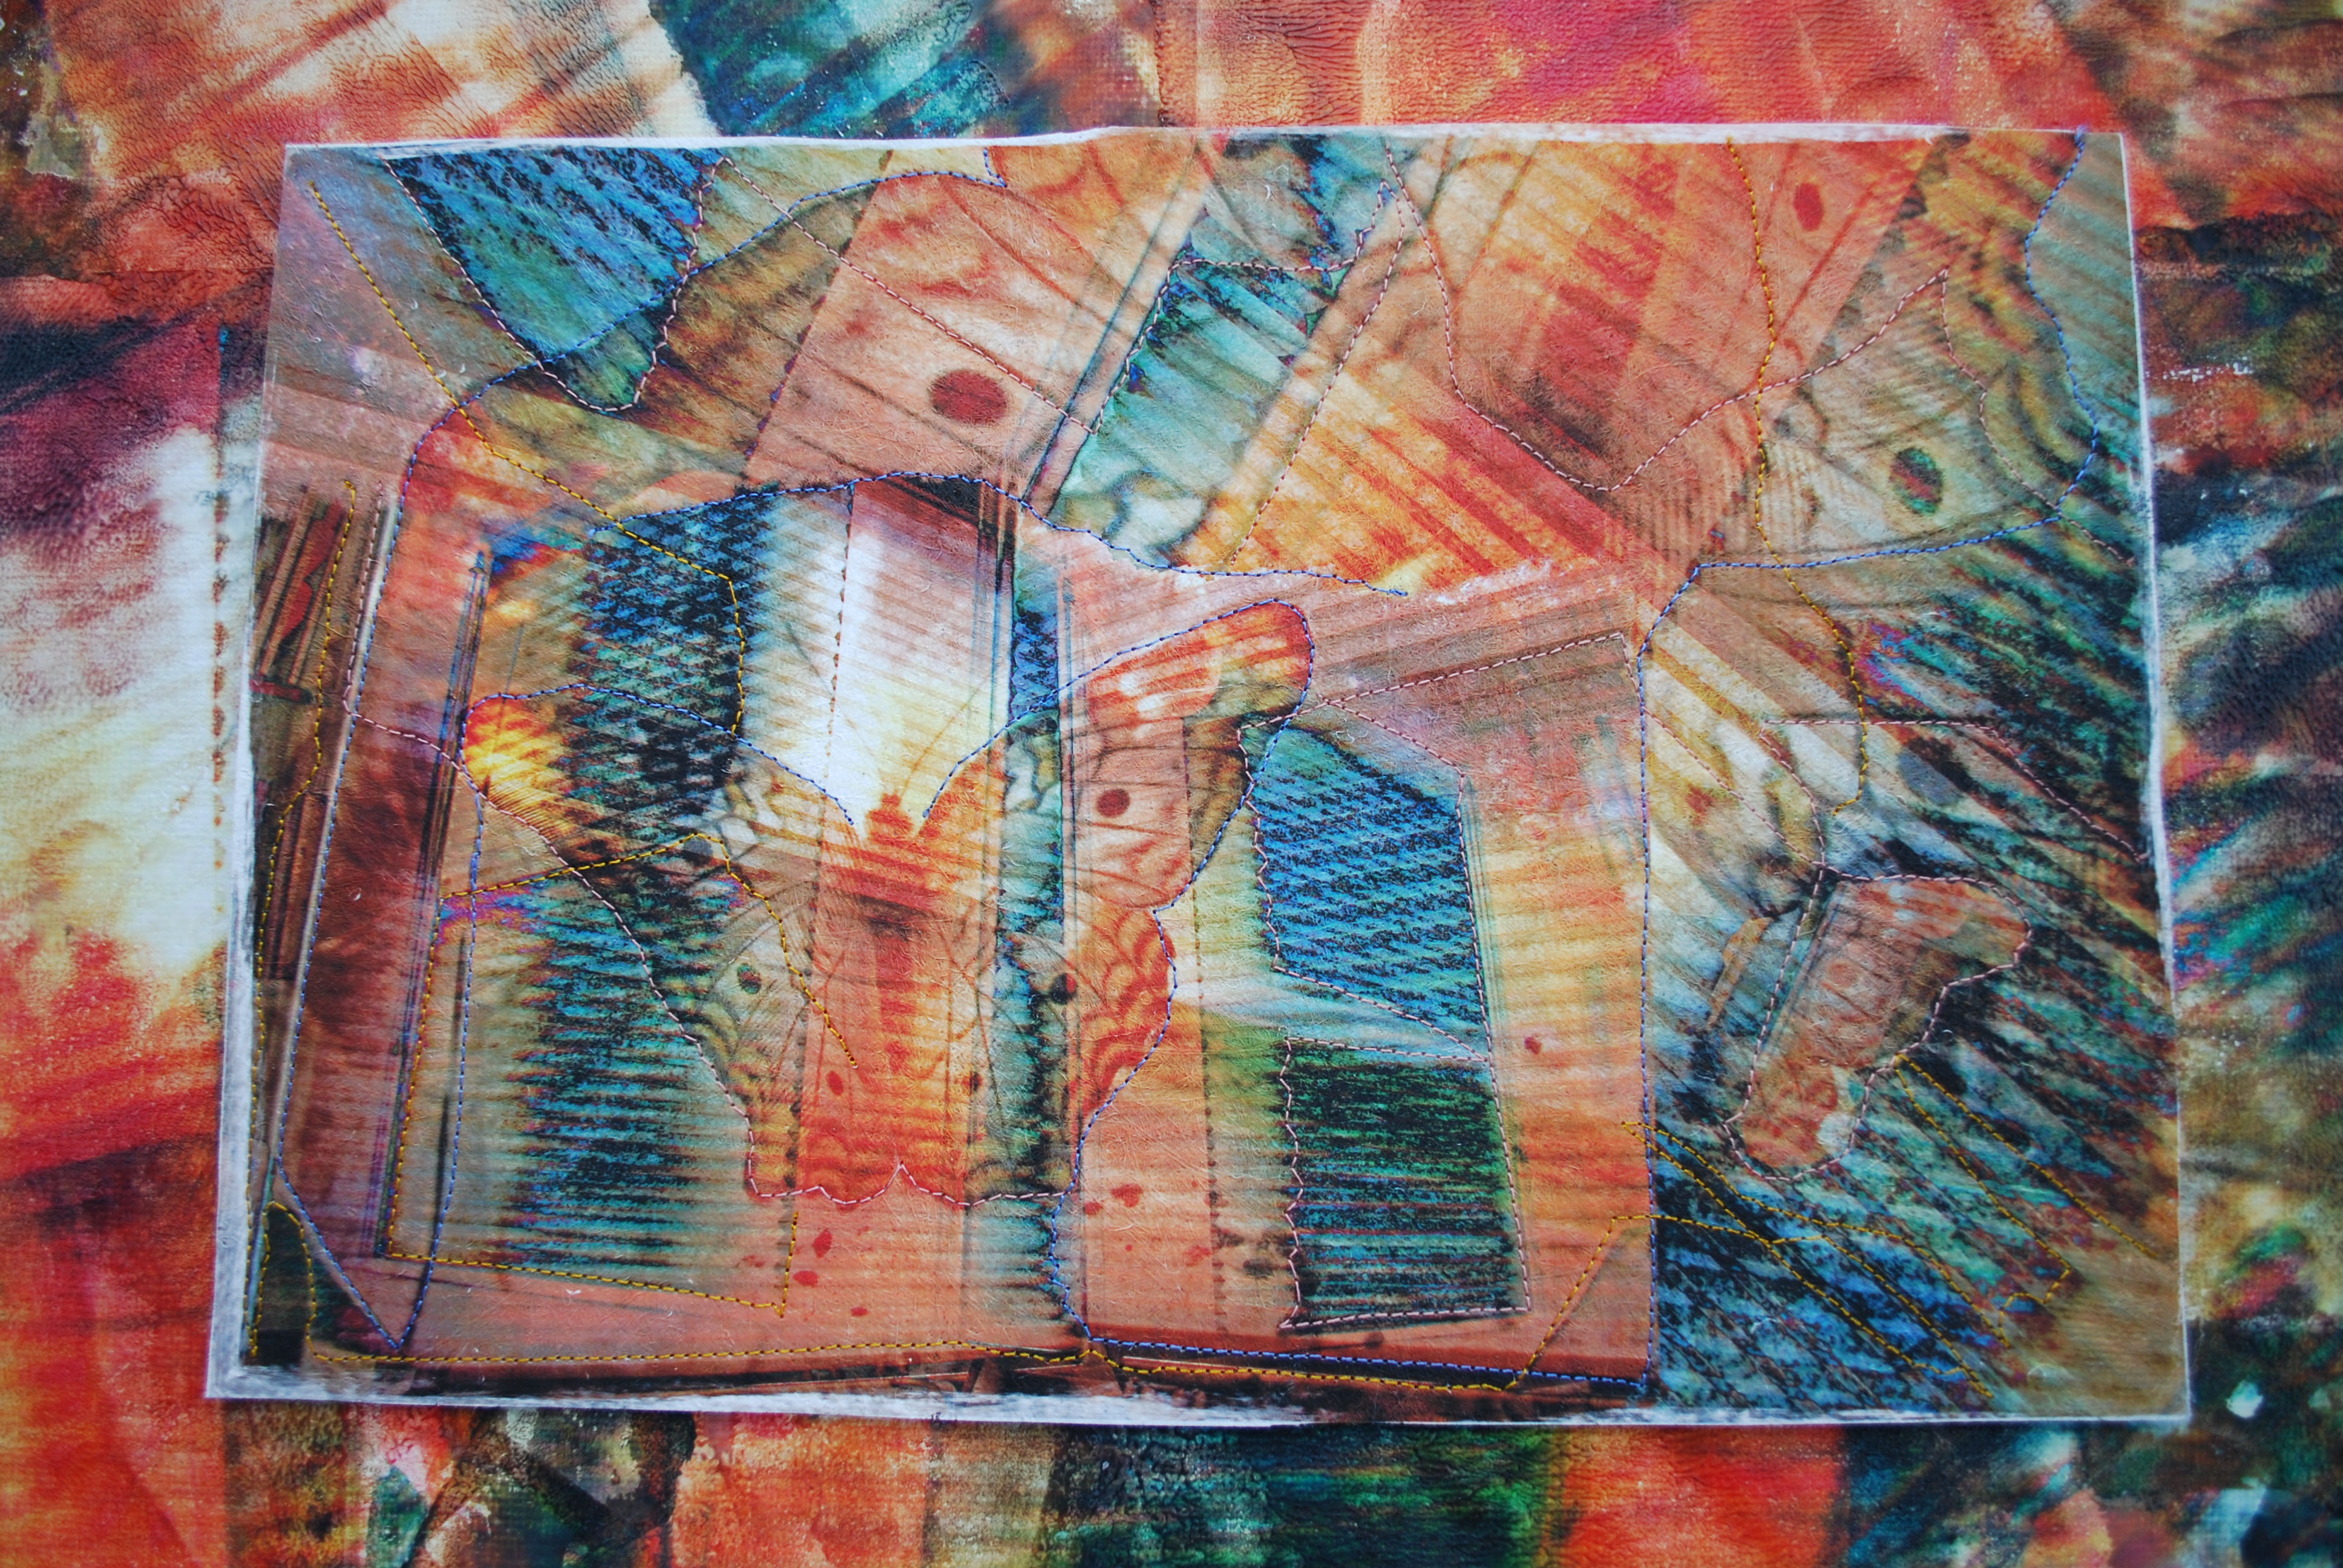 Butterfly window collage on lutradur